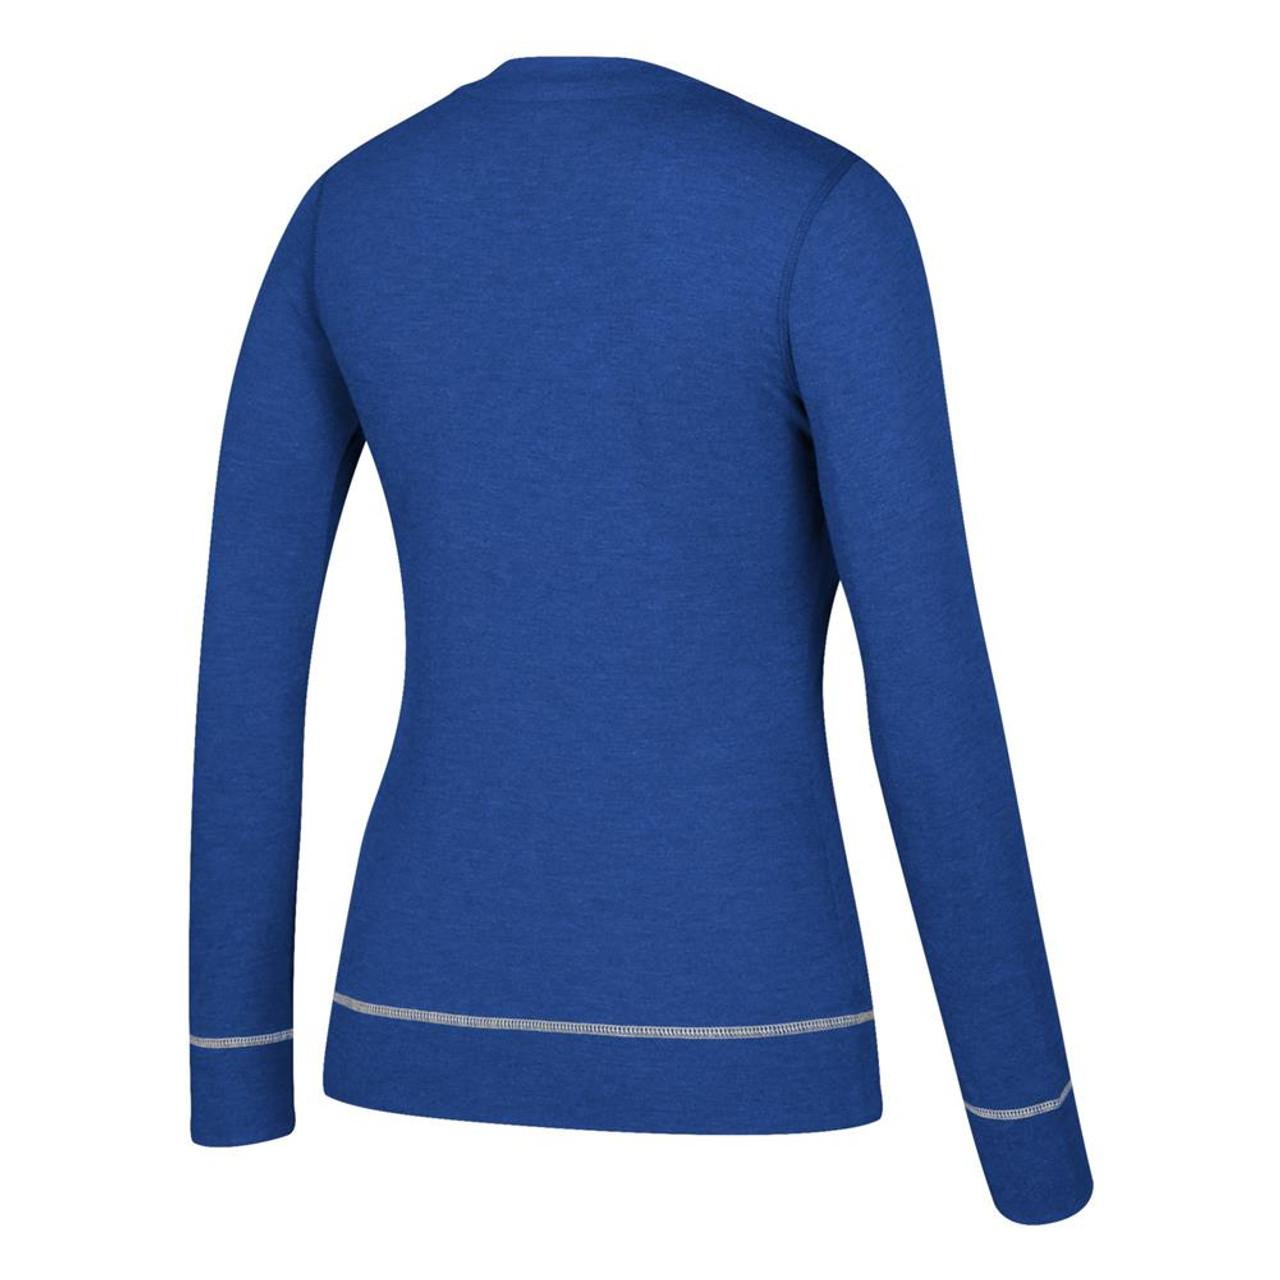 Women's Nashville Predators Long Sleeve Adidas Skate Lace Top